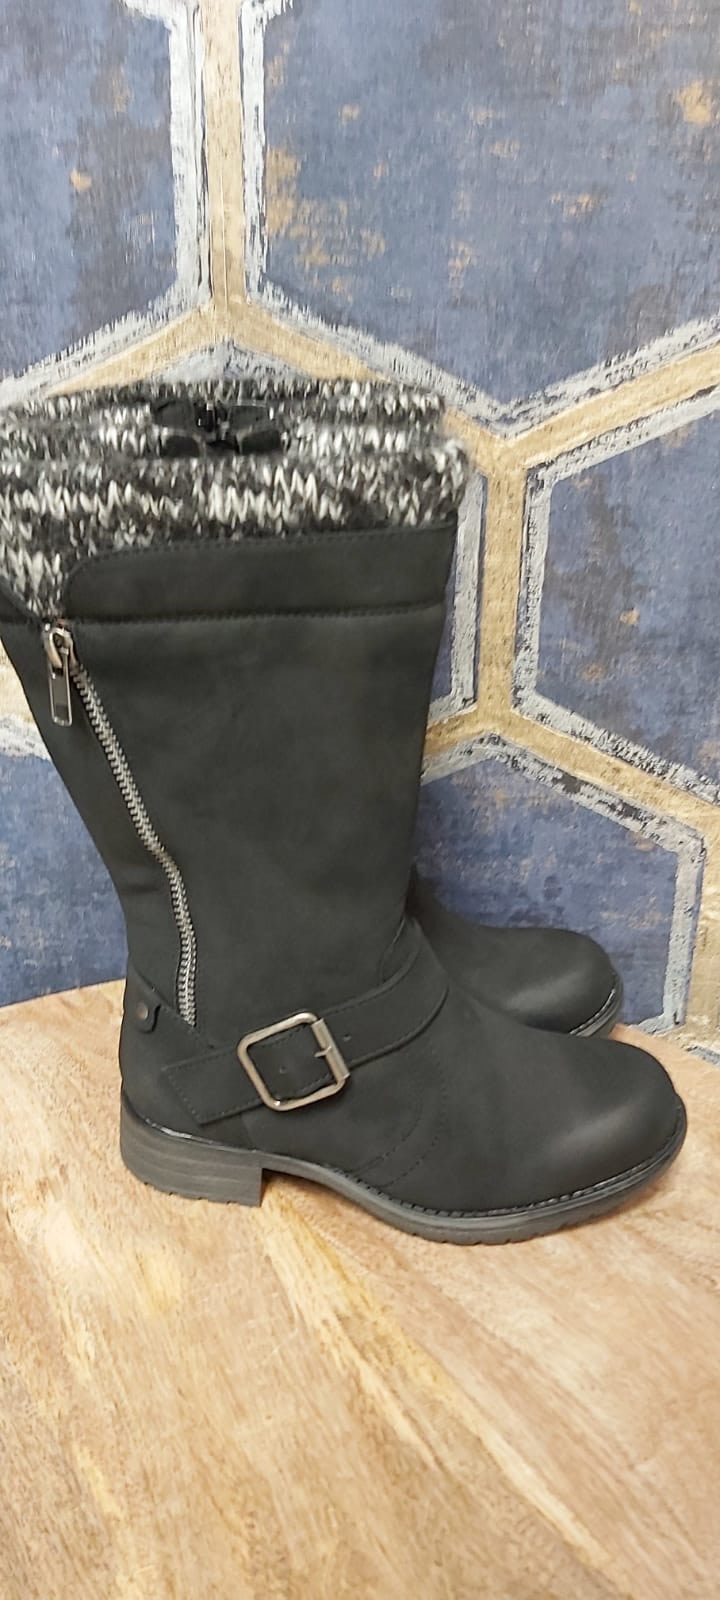 Girls Glosette Boots